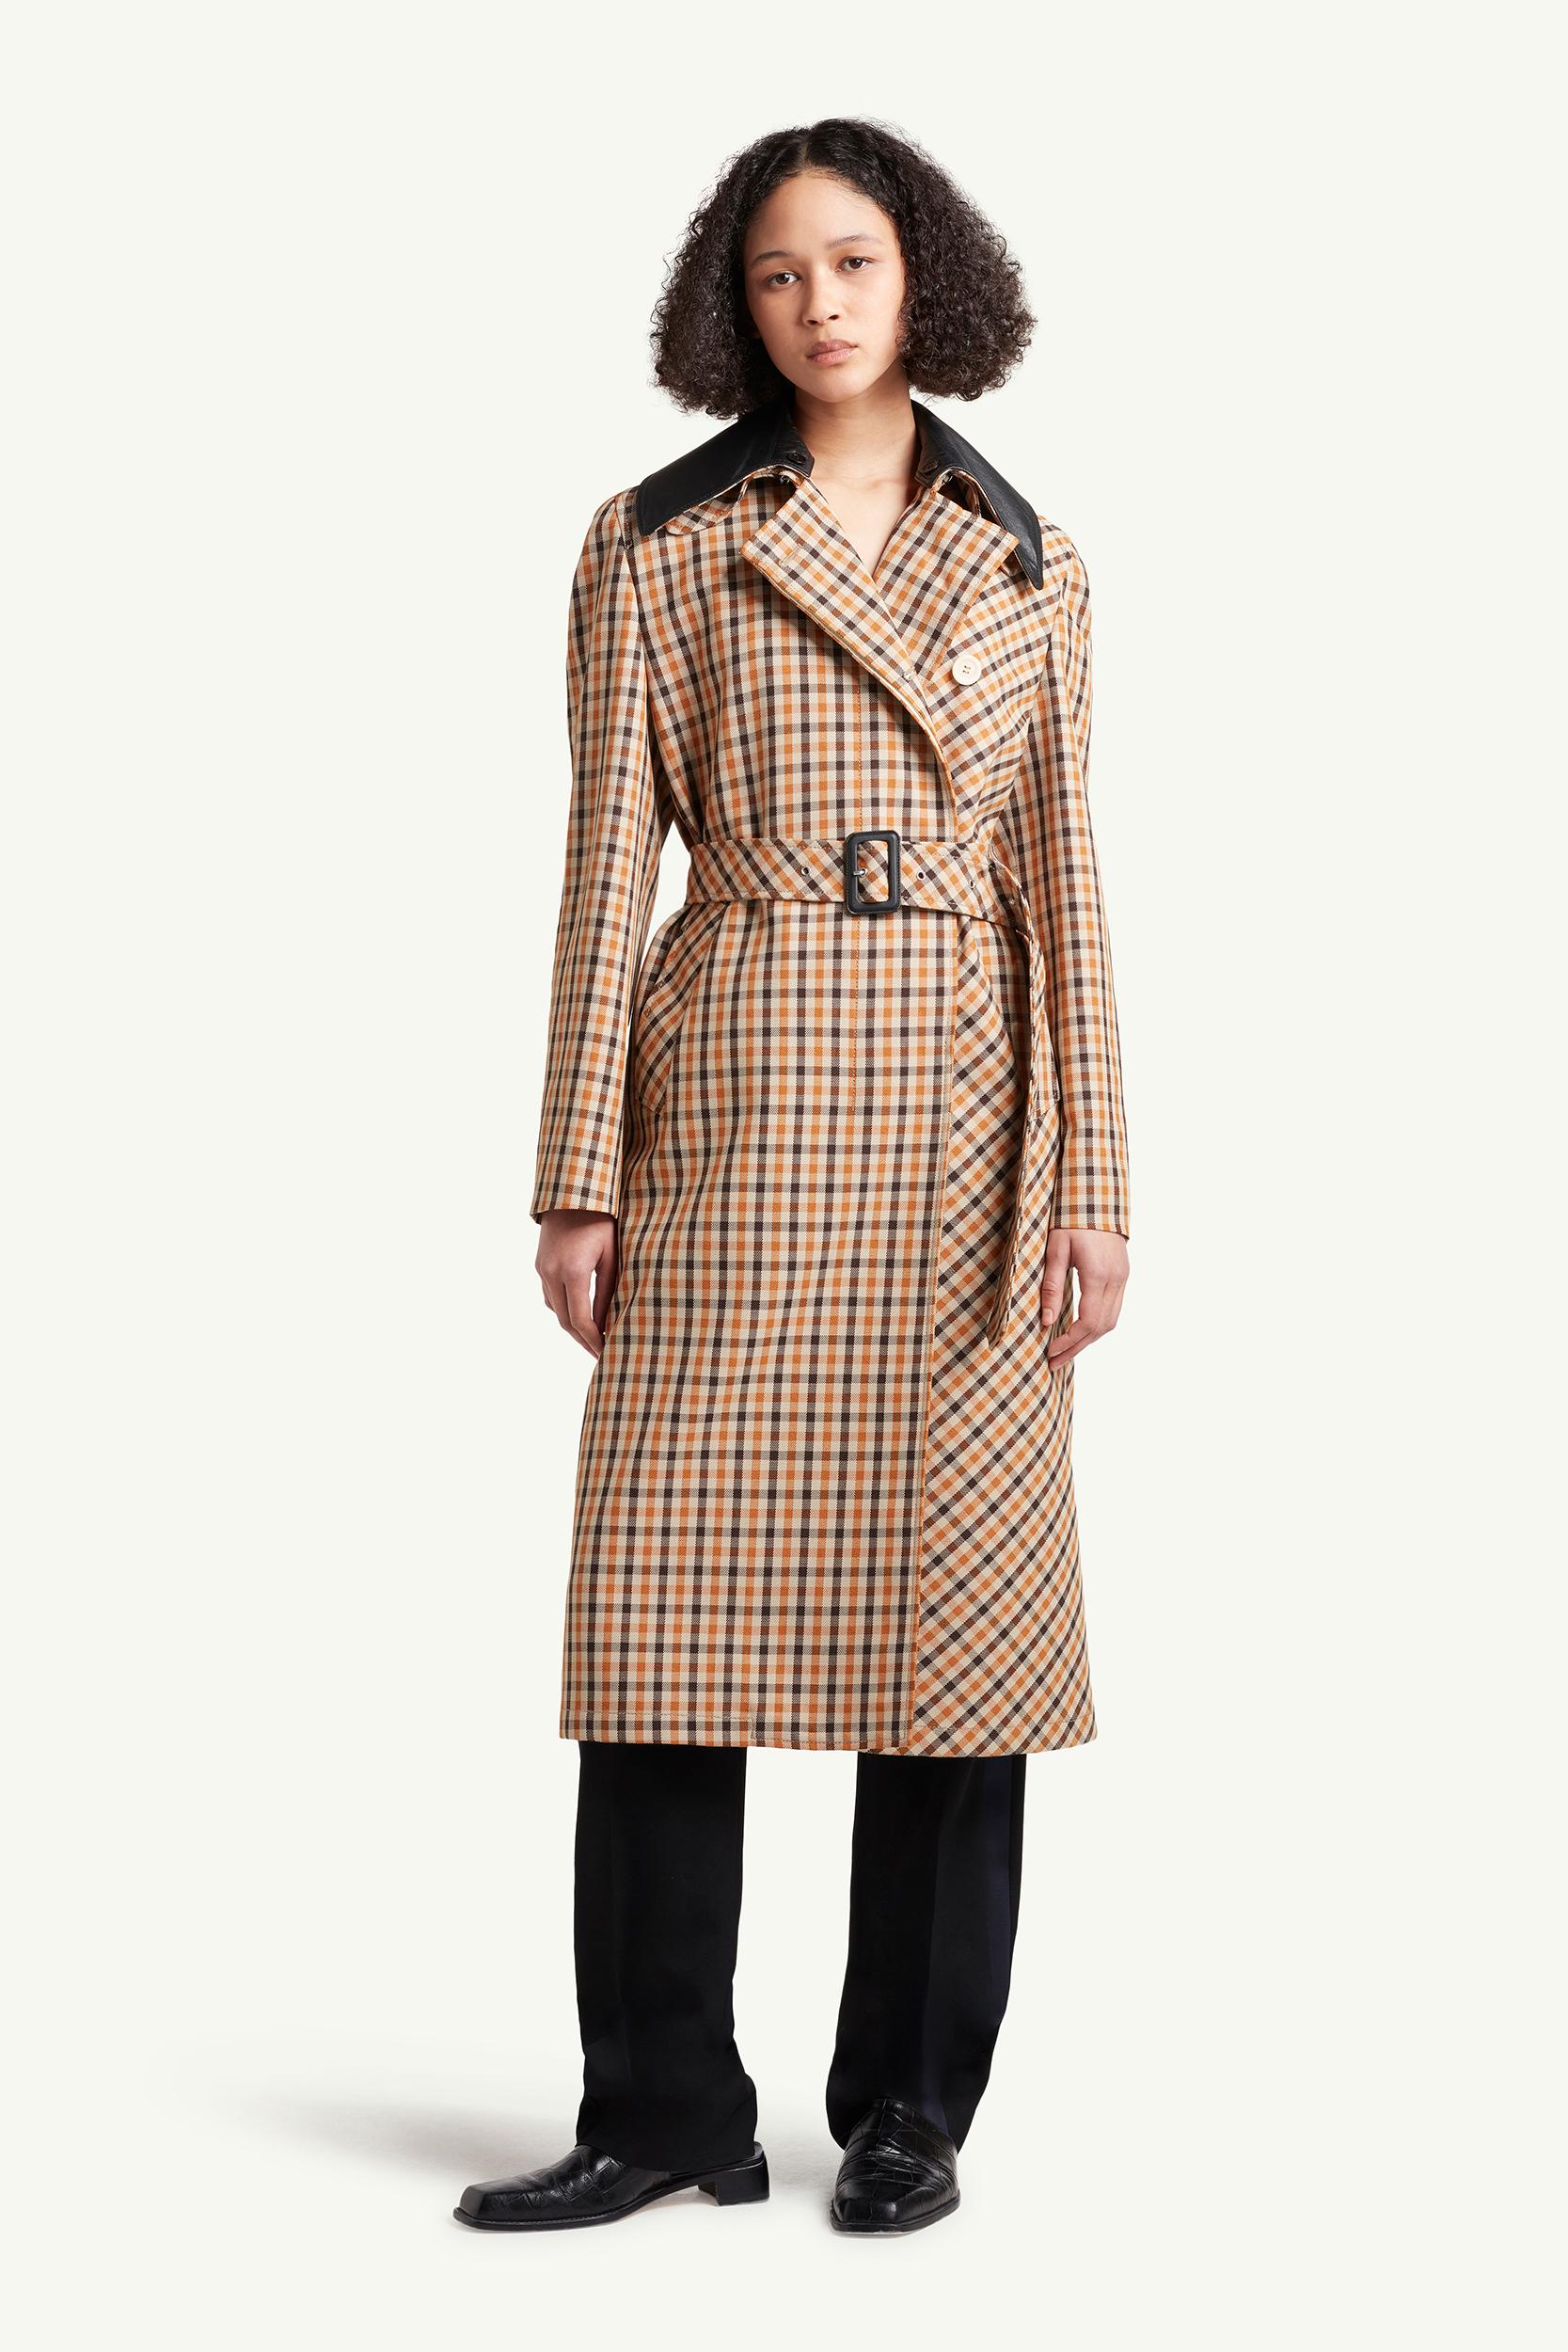 Womenswear model wearing light brown checkered Wales Bonner coat | e-Commerce Photography London | LRP